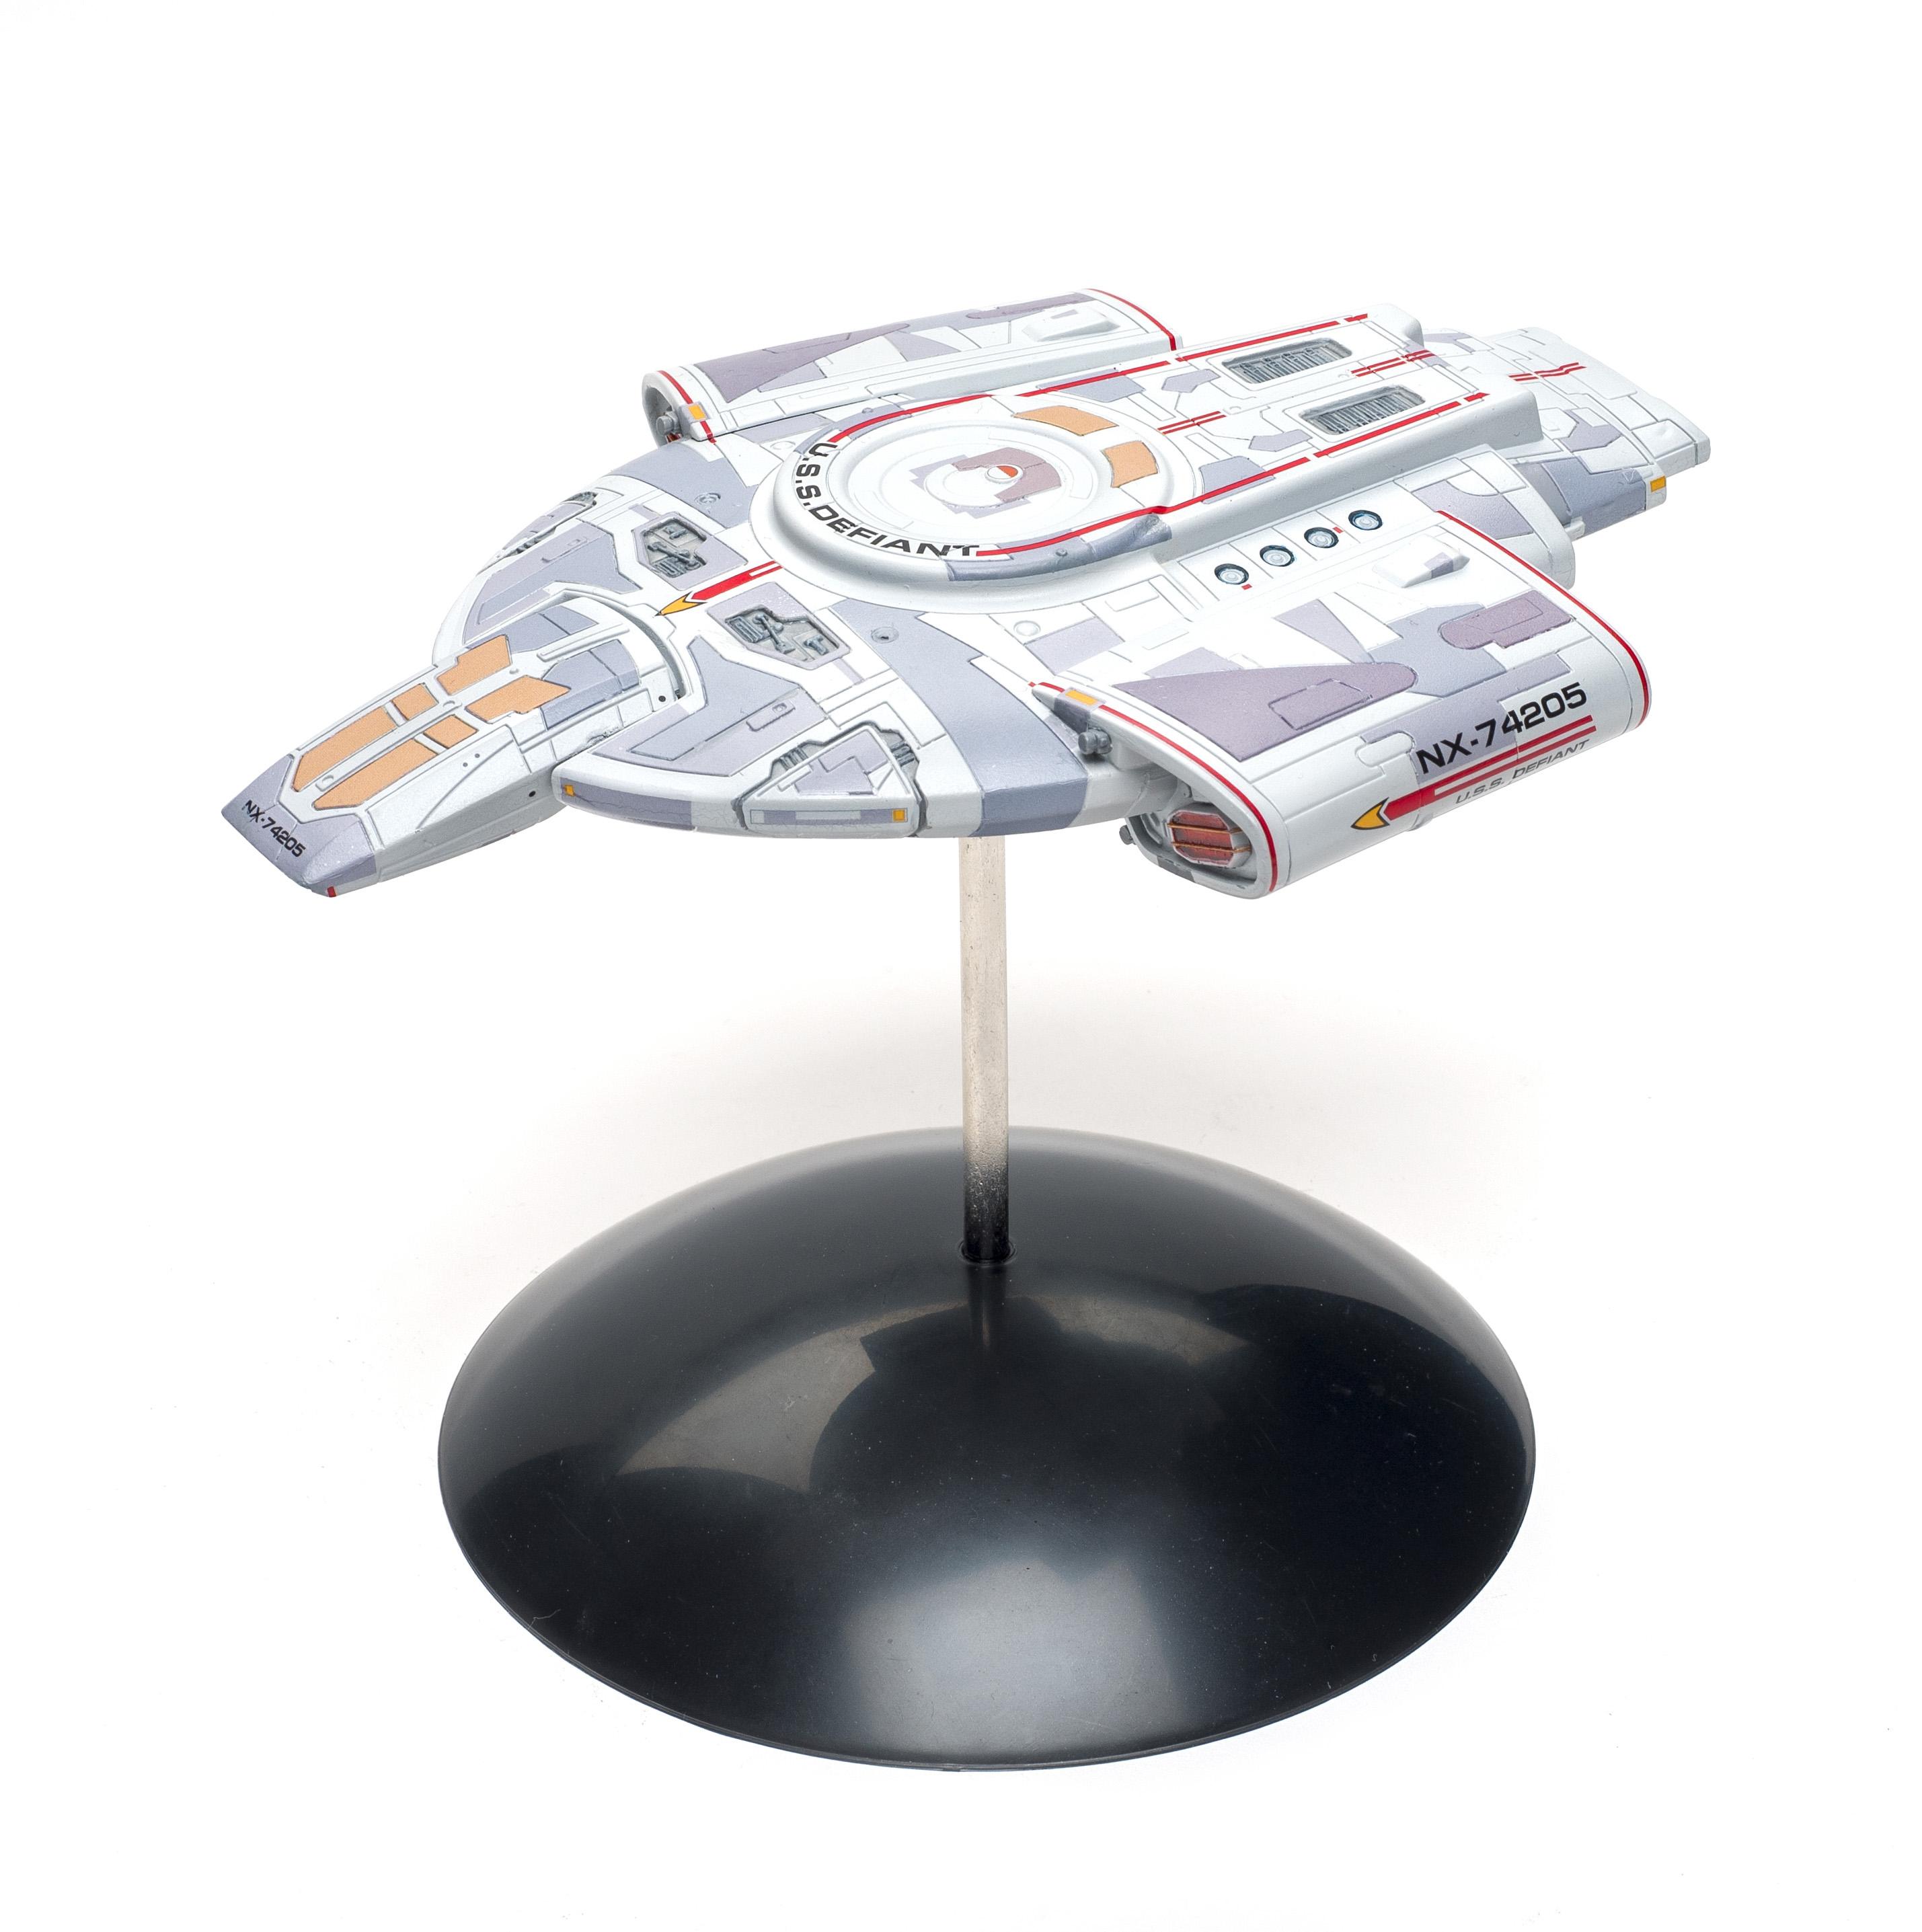 Build review of the Polar Lights Star Trek USS Defiant scale